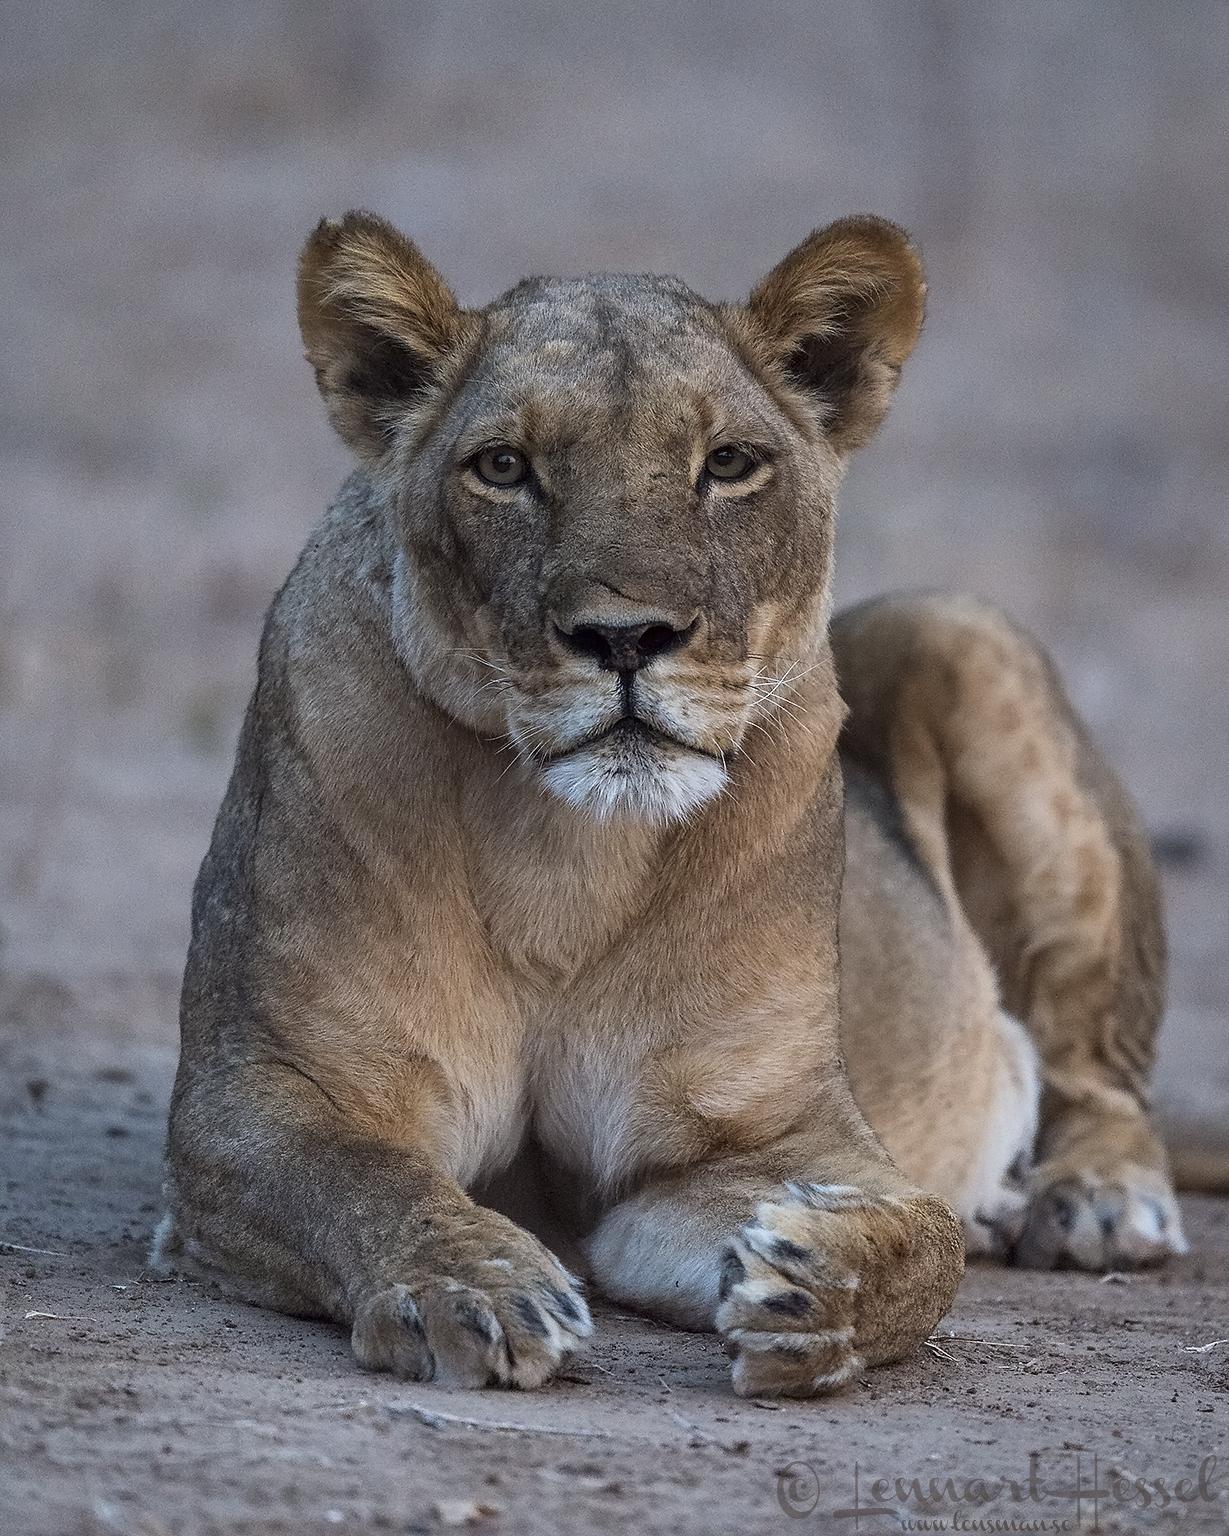 Lioness Mana Pools National Park